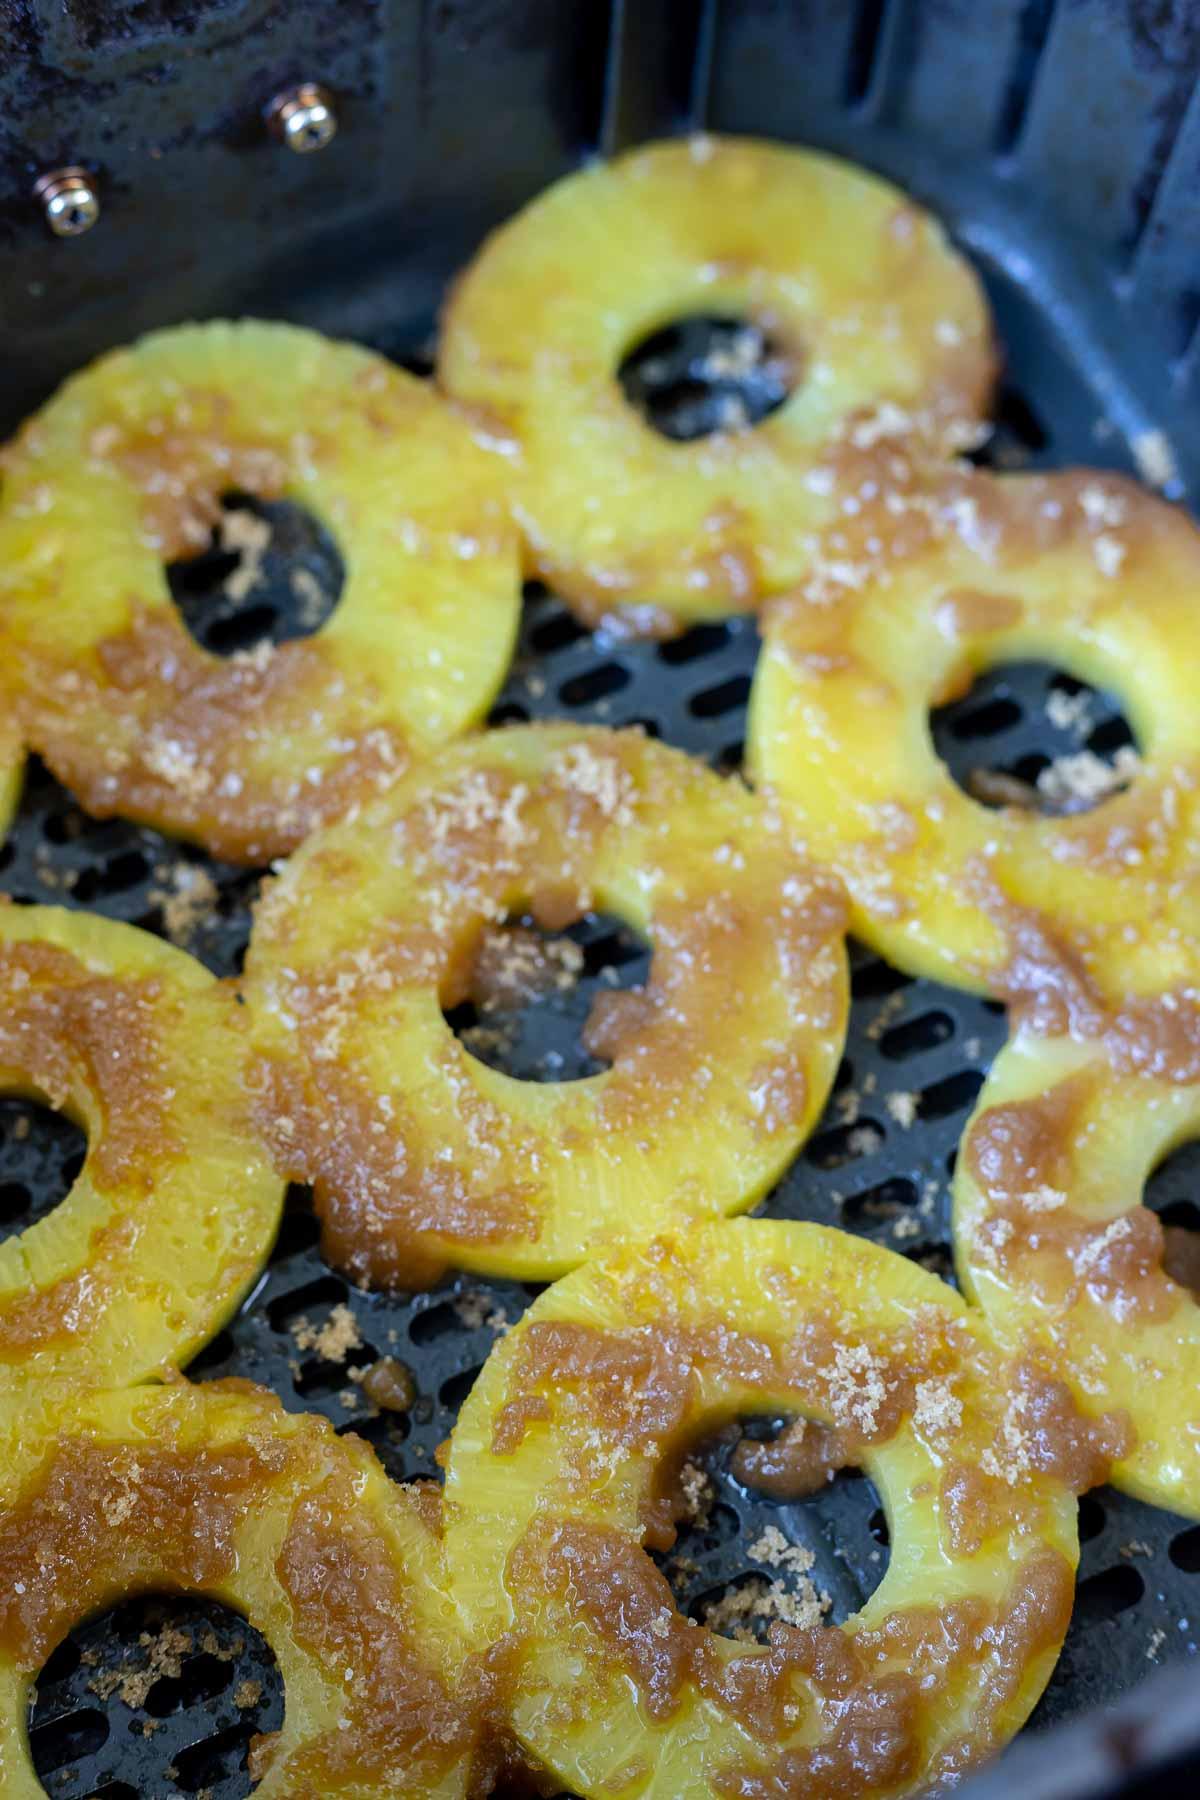 pineapple rings topped with brown sugar in air fryer basket